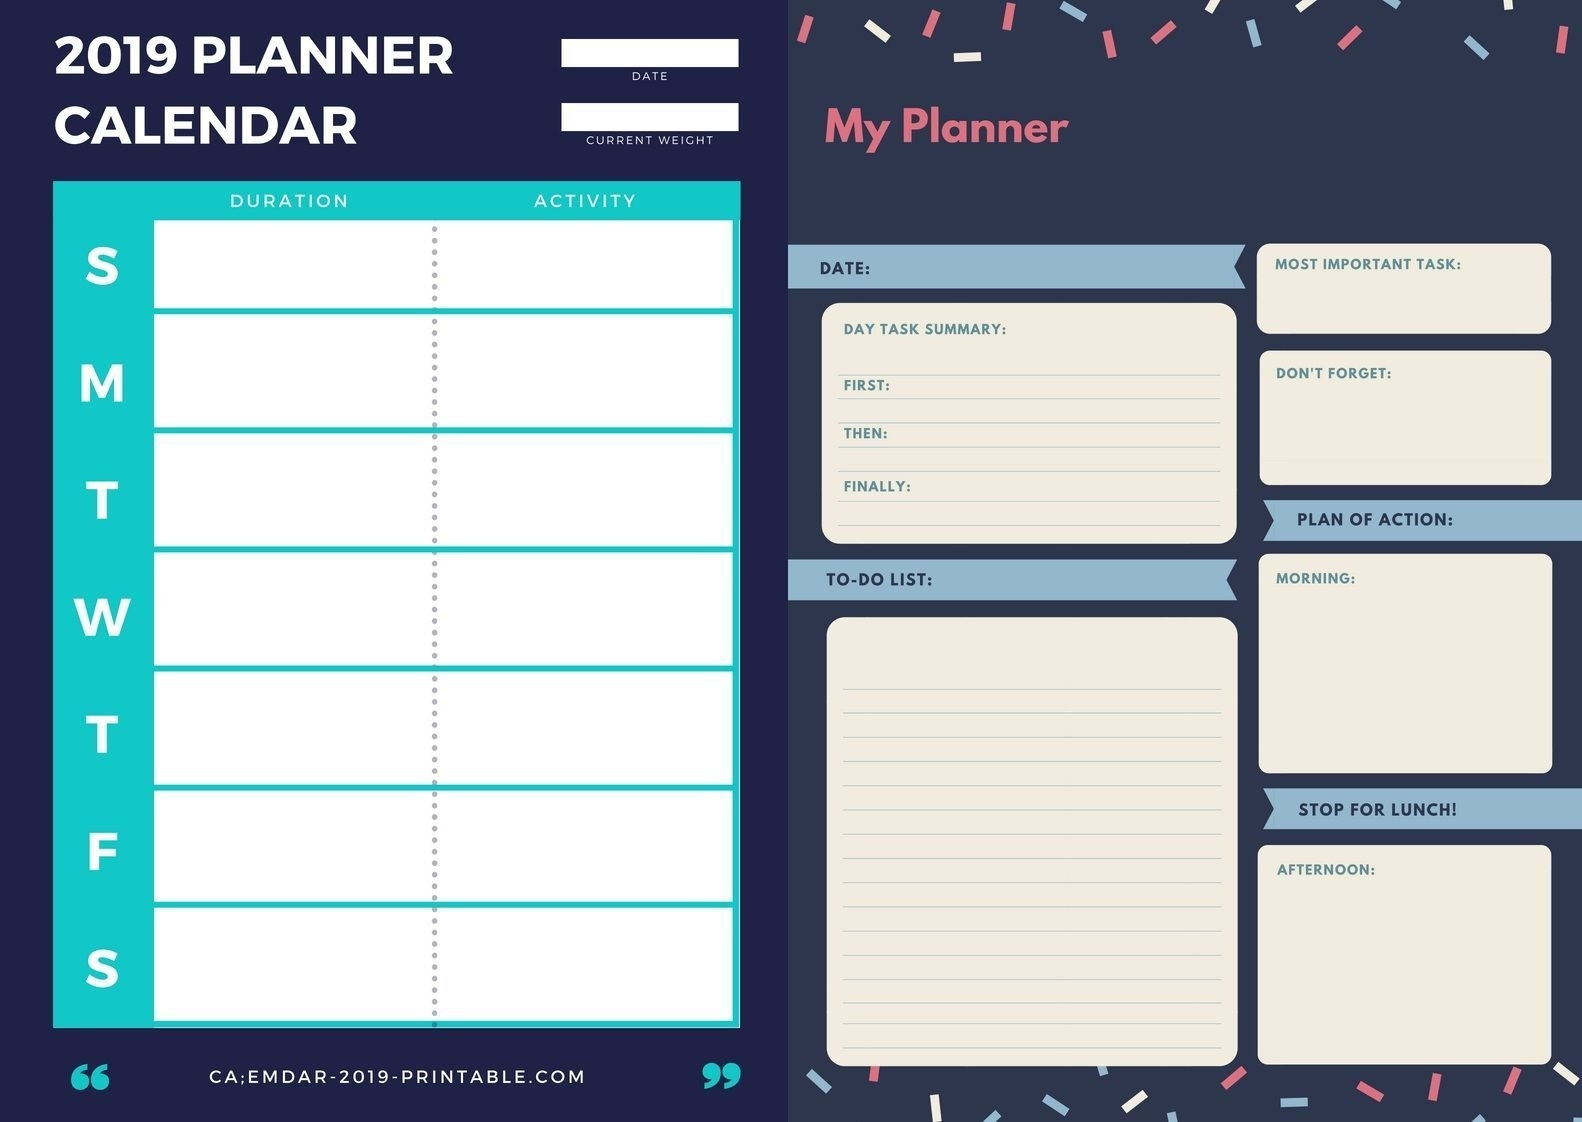 2019 Yearly Planner Calendar | Monthly Planners | Pinterest Calendar 2019 Year Planner Printable